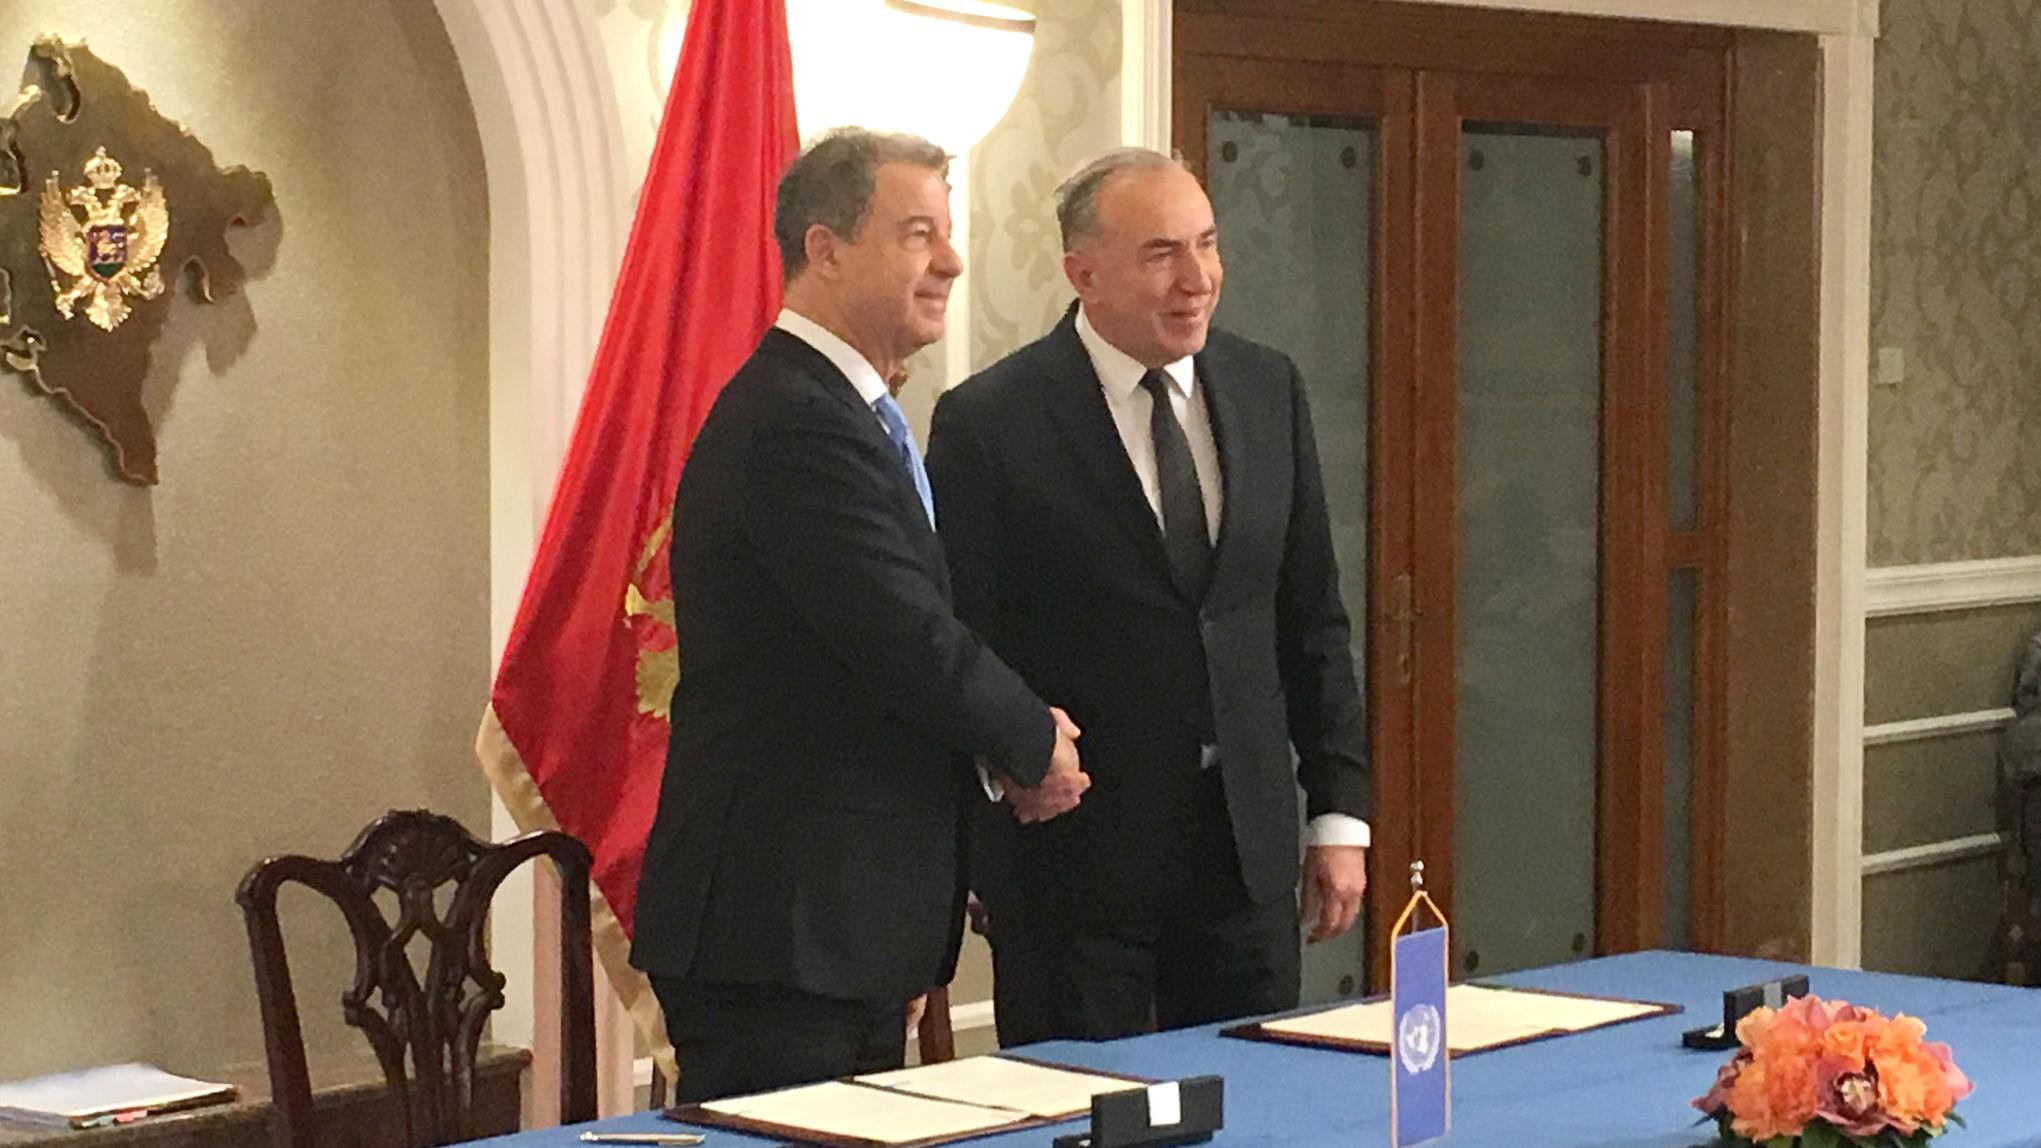 Mechanism Chief Prosecutor Serge Brammertz and Supreme State Prosecutor of Montenegro Ivica Stanković